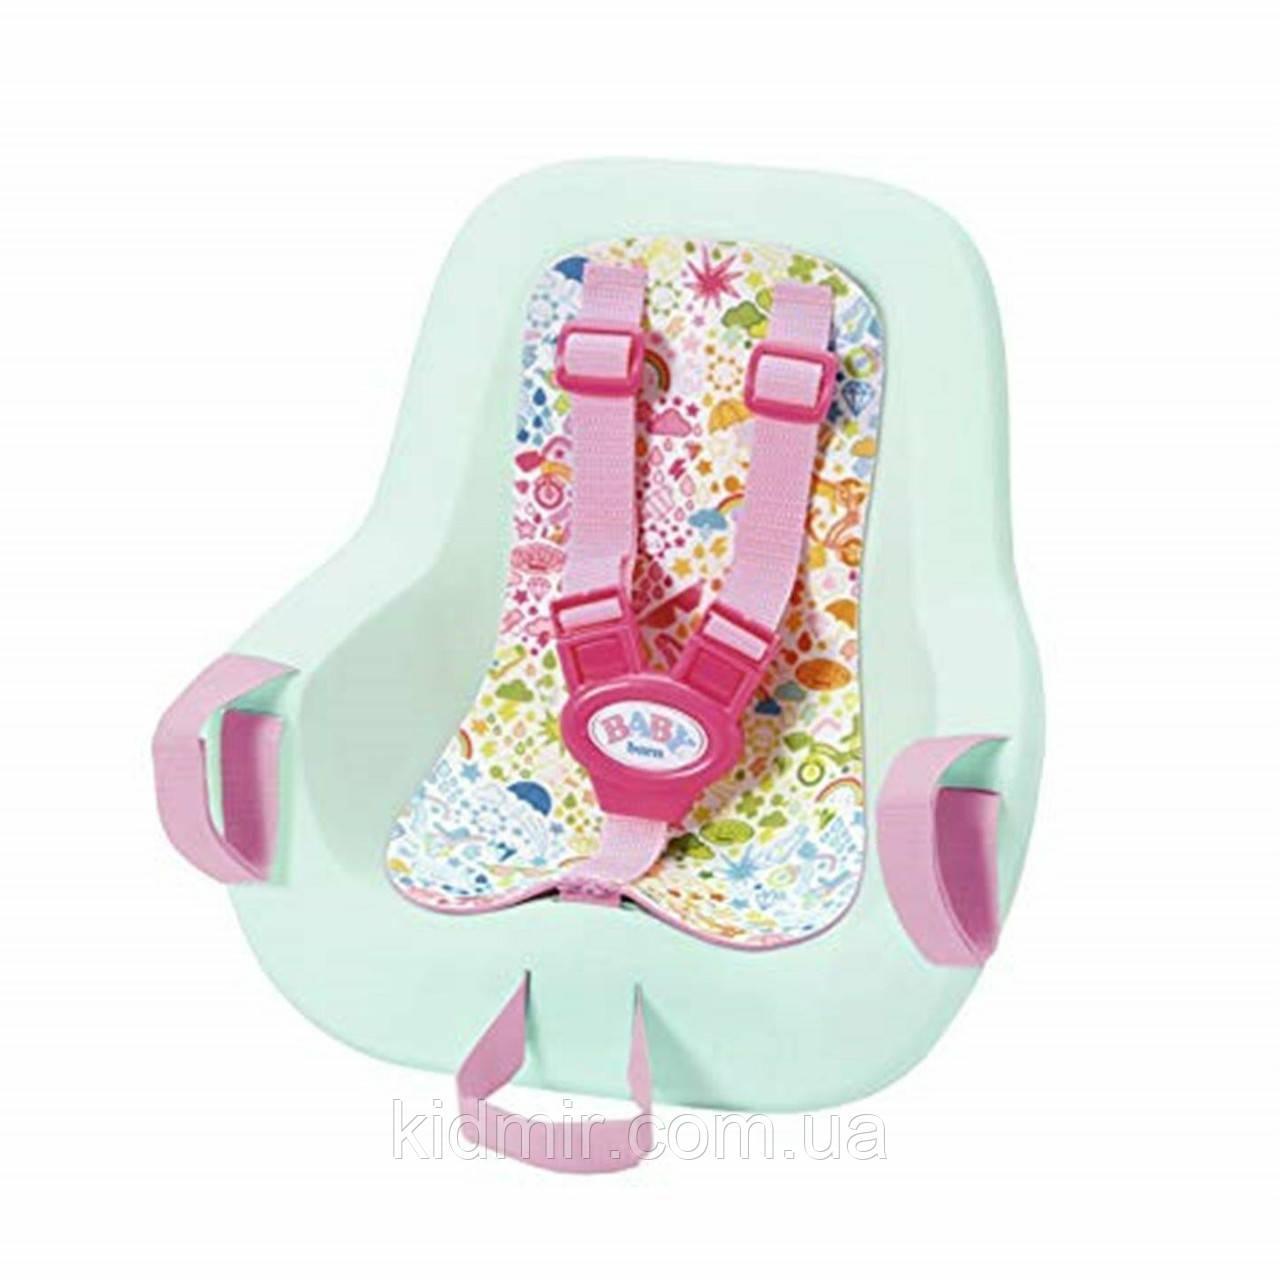 Велосипедное кресло для куклы пупса Беби Борн Baby Born Zapf Creation 827277